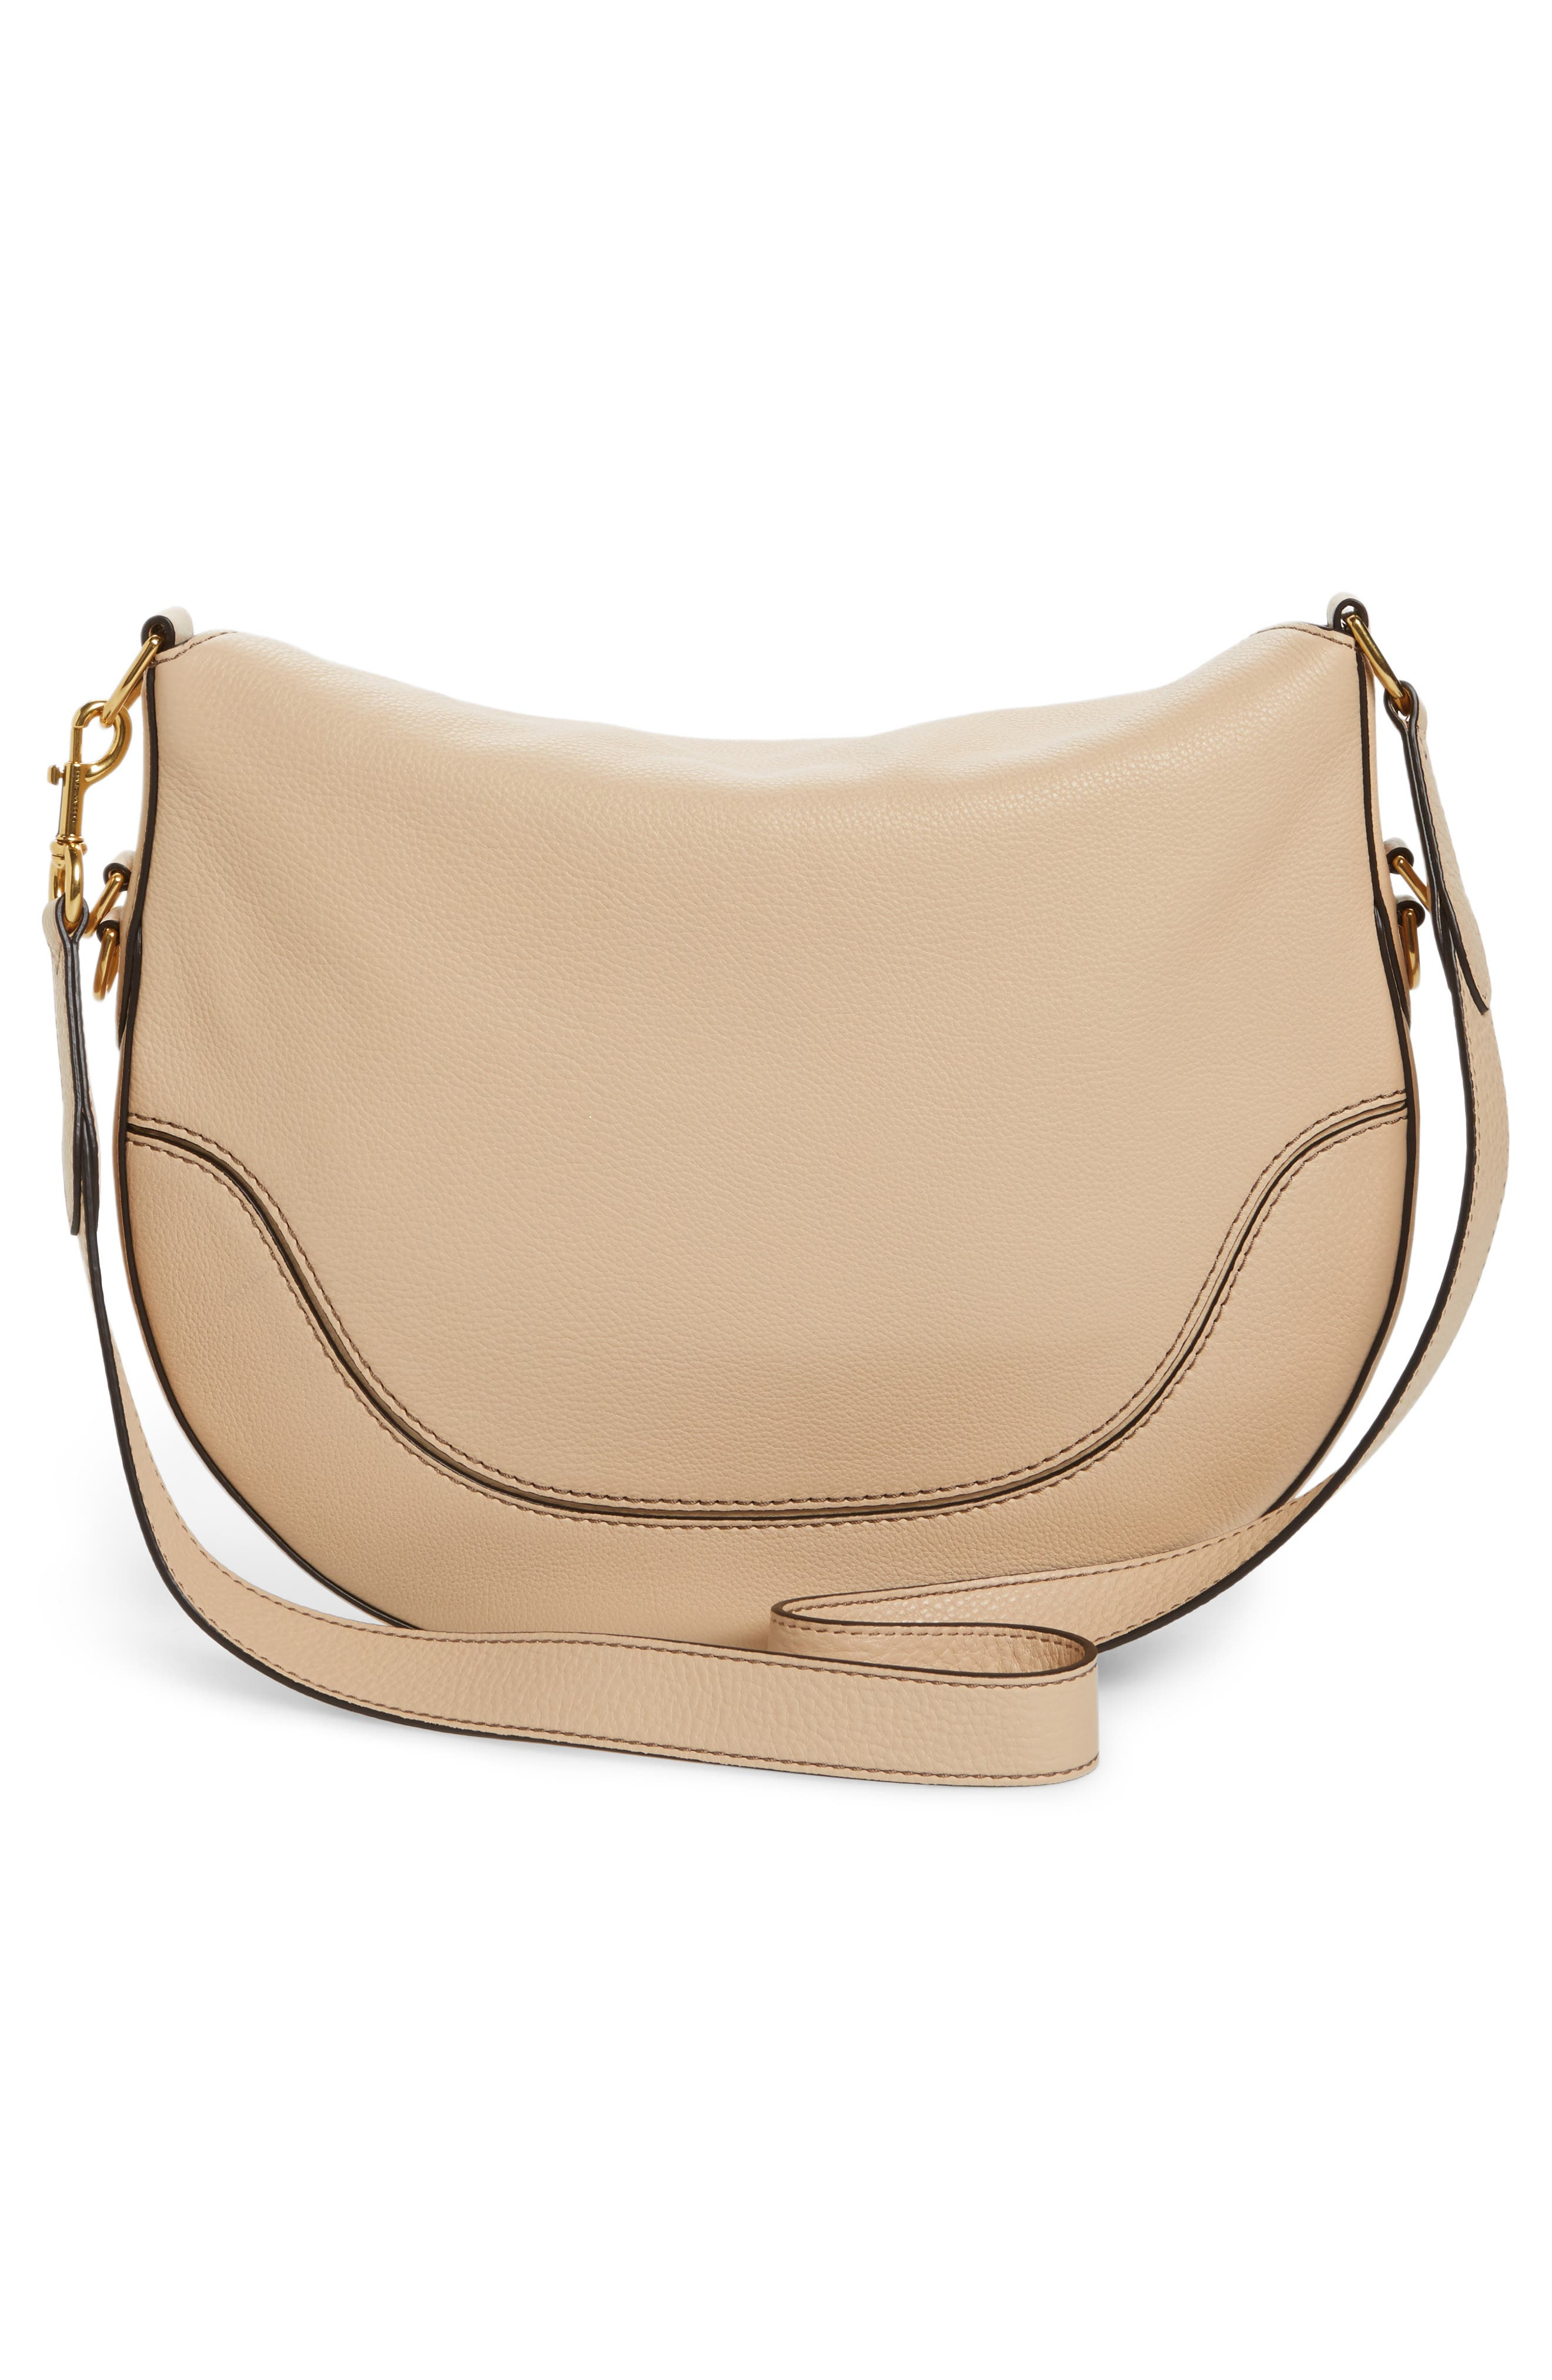 MARC JACOBS Leather Shoulder Bag in Neutrals